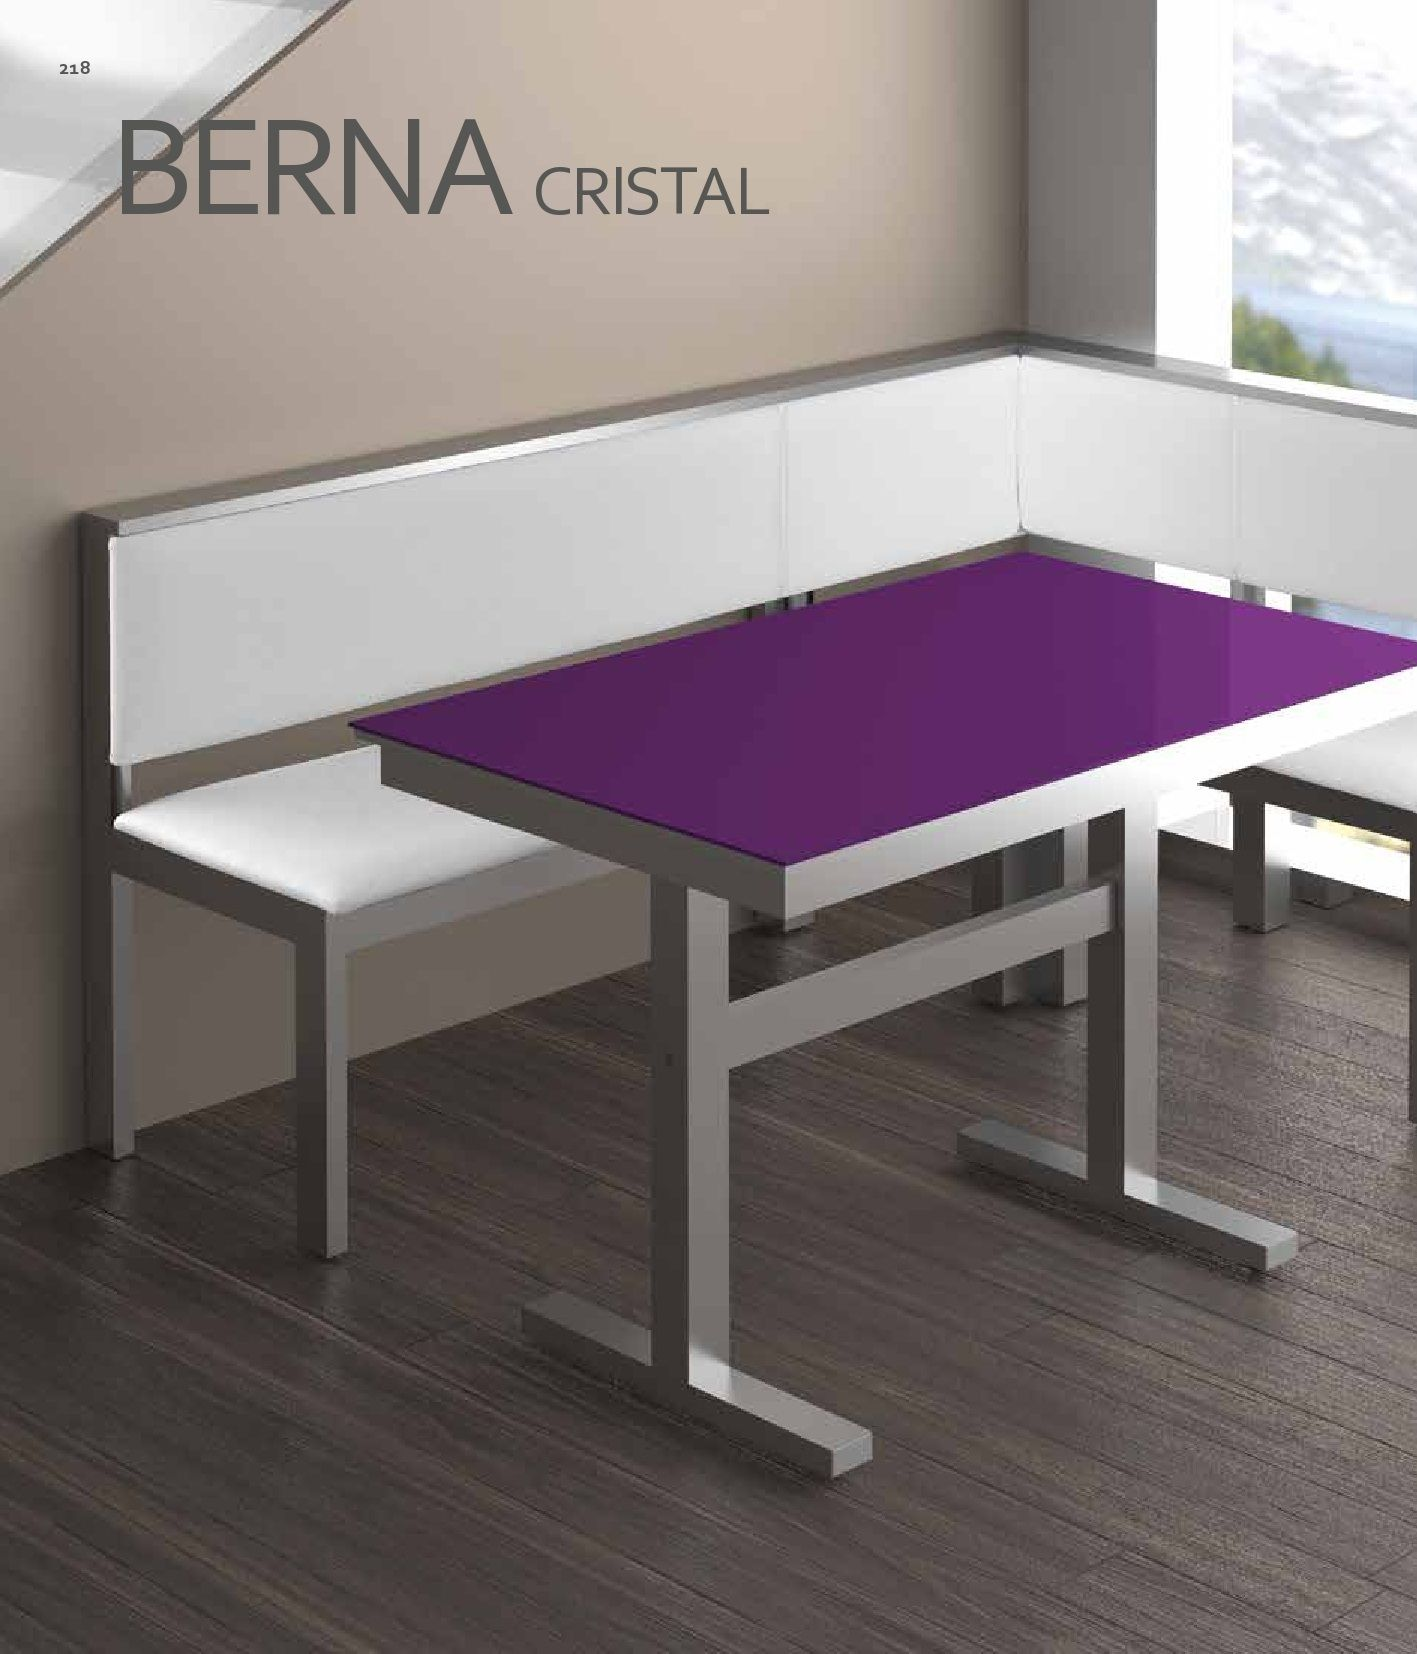 Mesas cocina mesa cocina rinconeras y bancos cocina - Mesas de cocina pequenas ikea ...